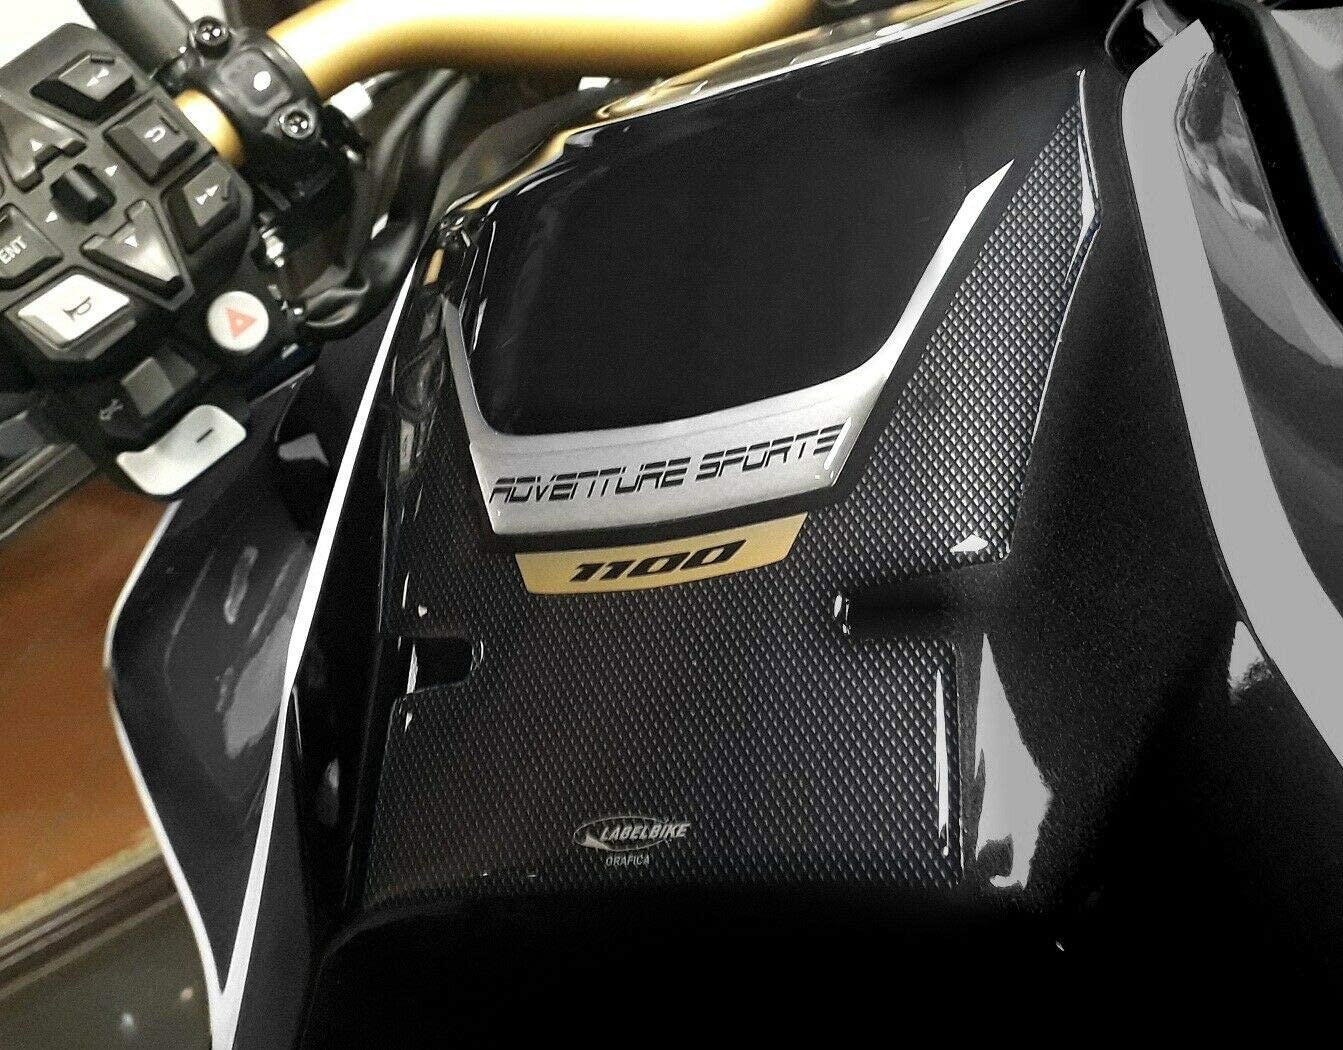 KIT 3 Stickers Gel Motorrad Tank kompatibel mit Honda Africa Twin Adventure Schwarz 1100 L.